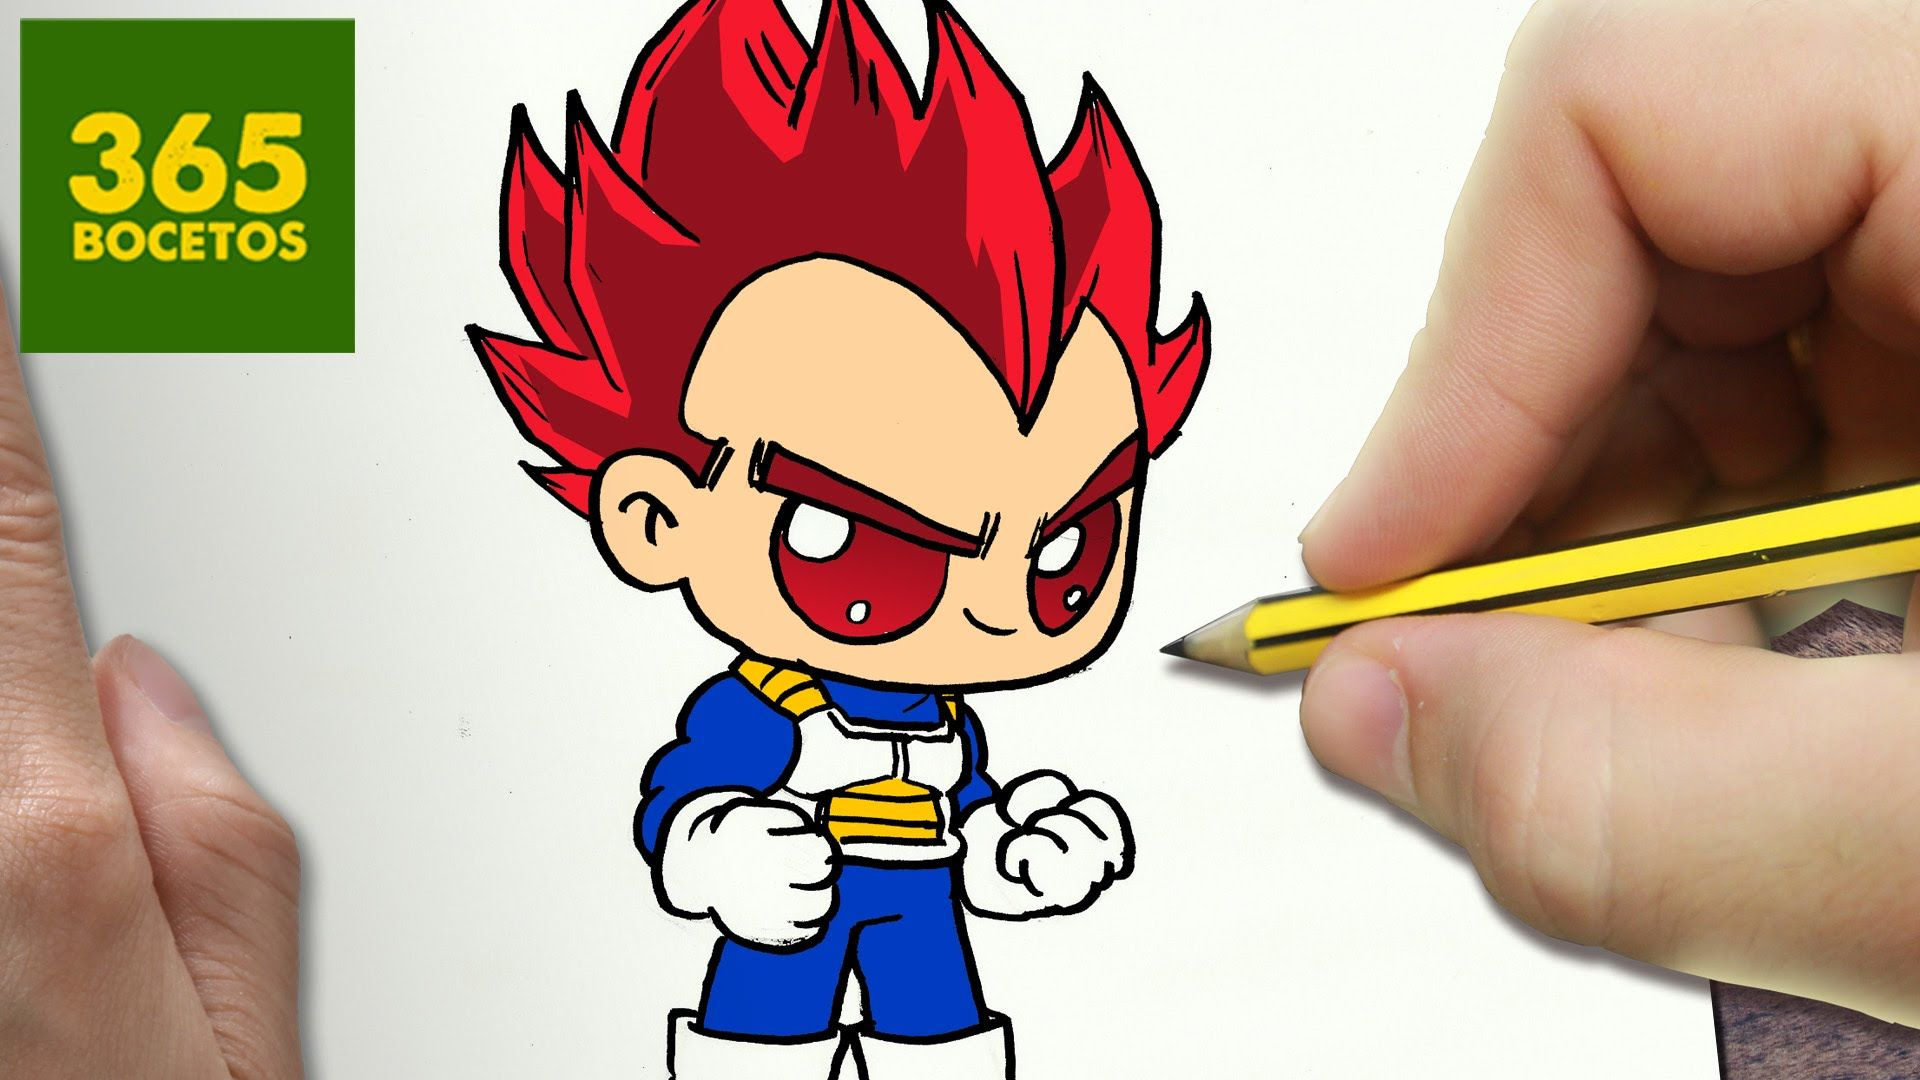 50 Imágenes De Goku Para Dibujar: COMO DIBUJAR VEGETA DIOS KAWAII PASO A PASO